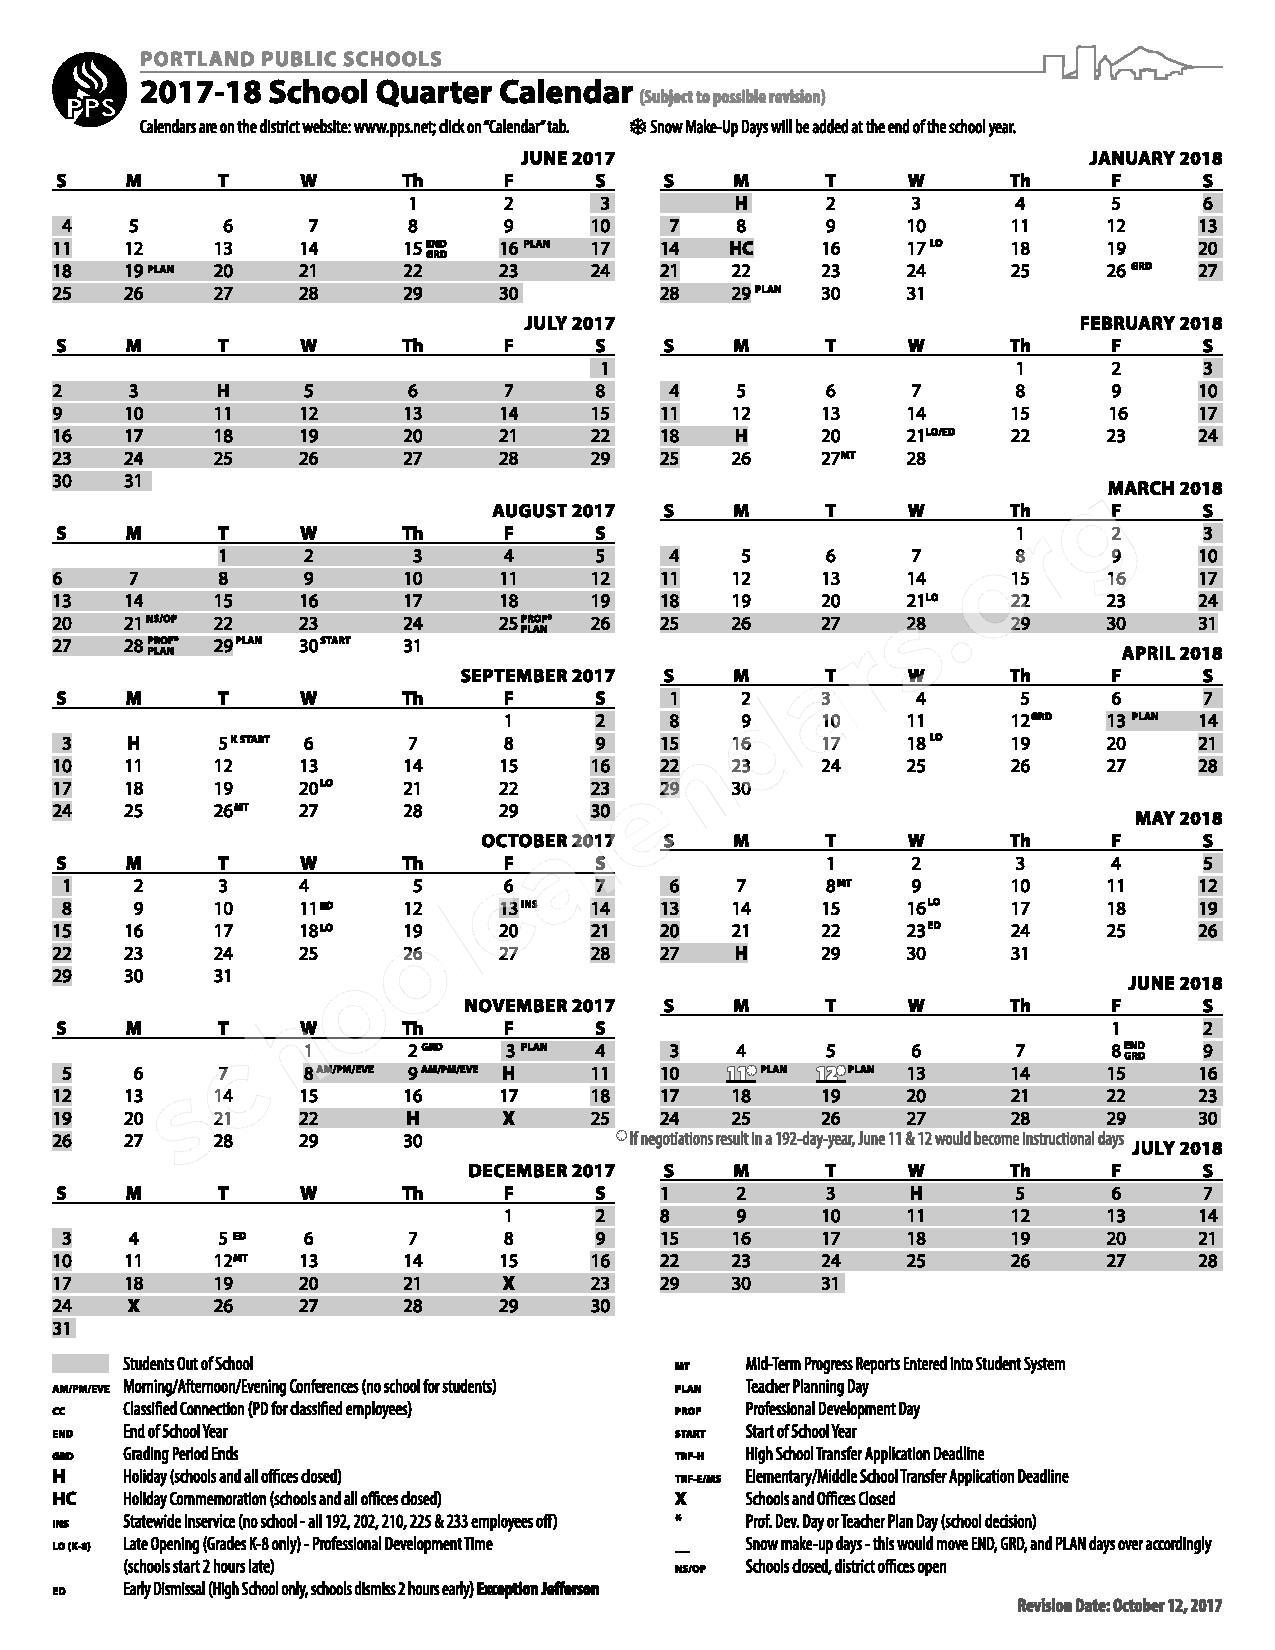 2017 - 2018 School Quarter Calendar – Portland Public Schools – page 1